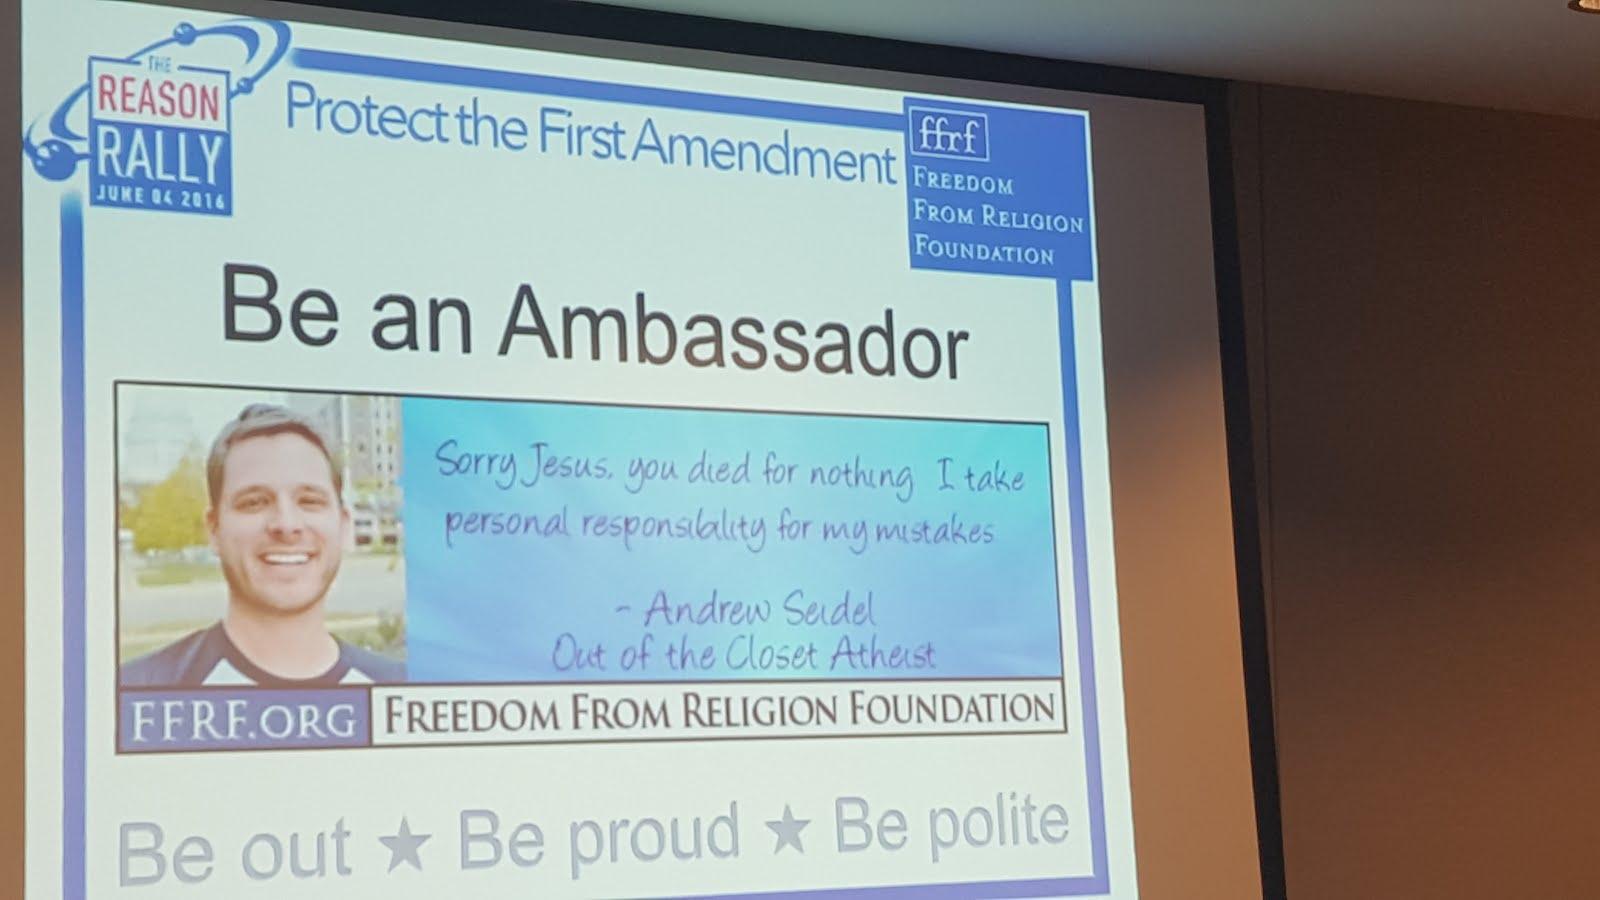 Freem from Religion Foundation